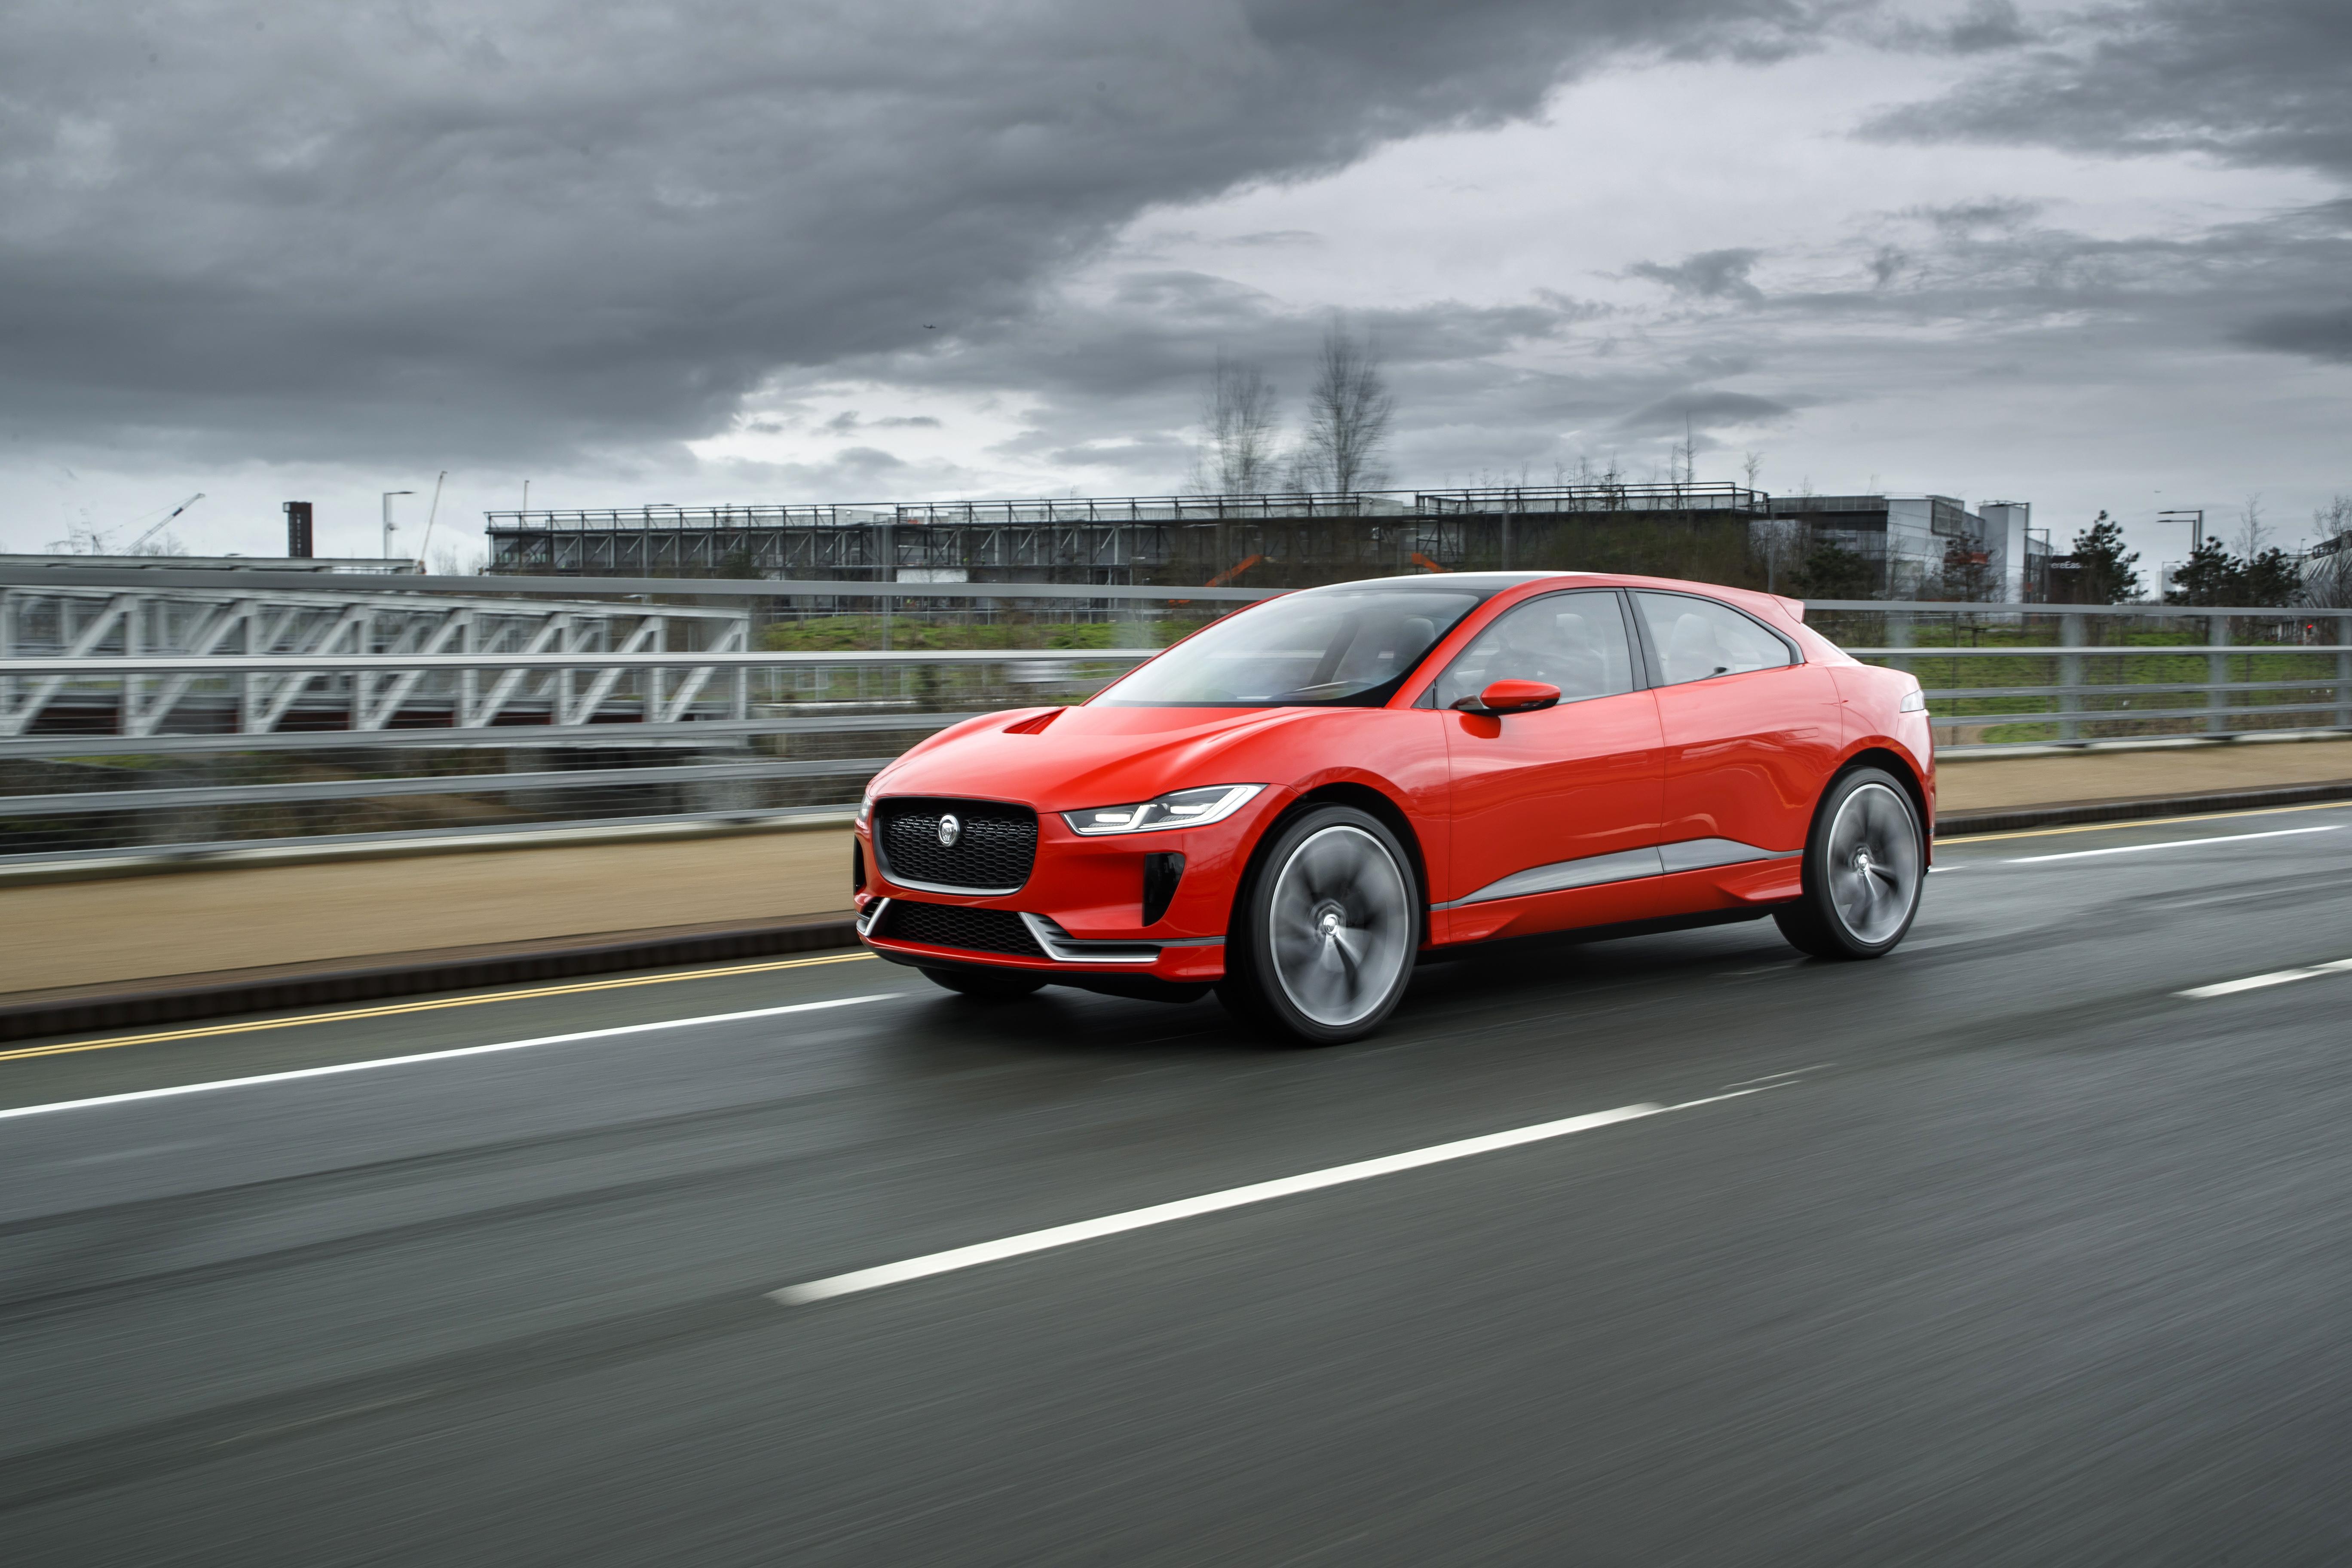 Jaguar Begins Testing I-Pace in London